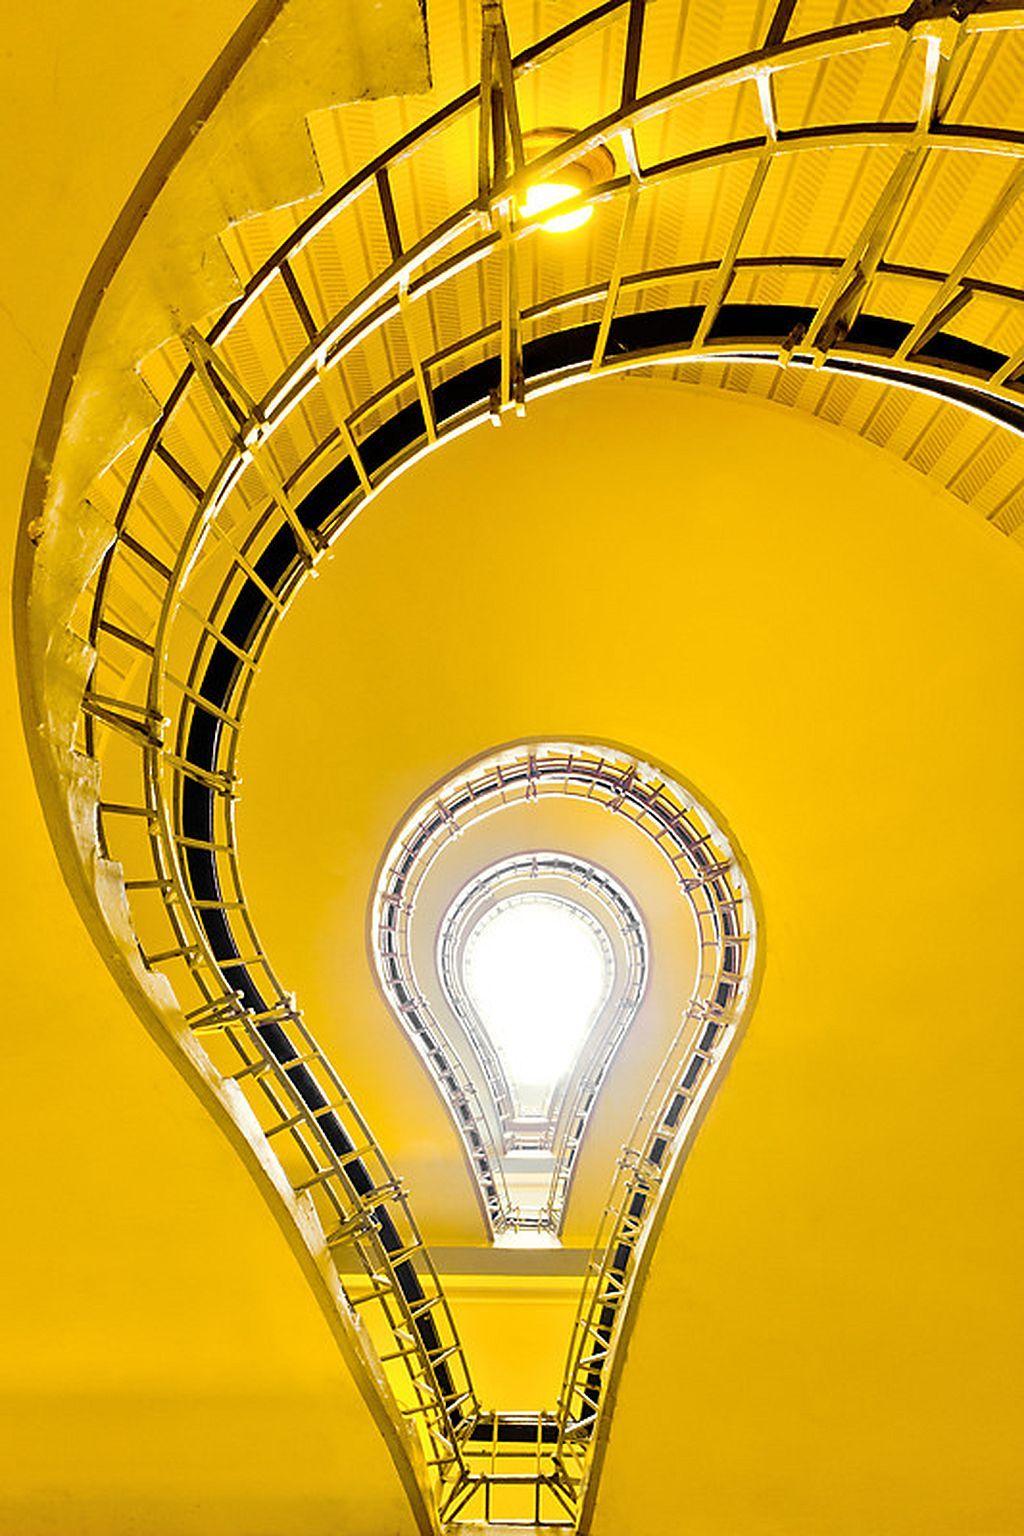 31 Light Bulb Staircase In Prague Prague, Bulb, Staircase